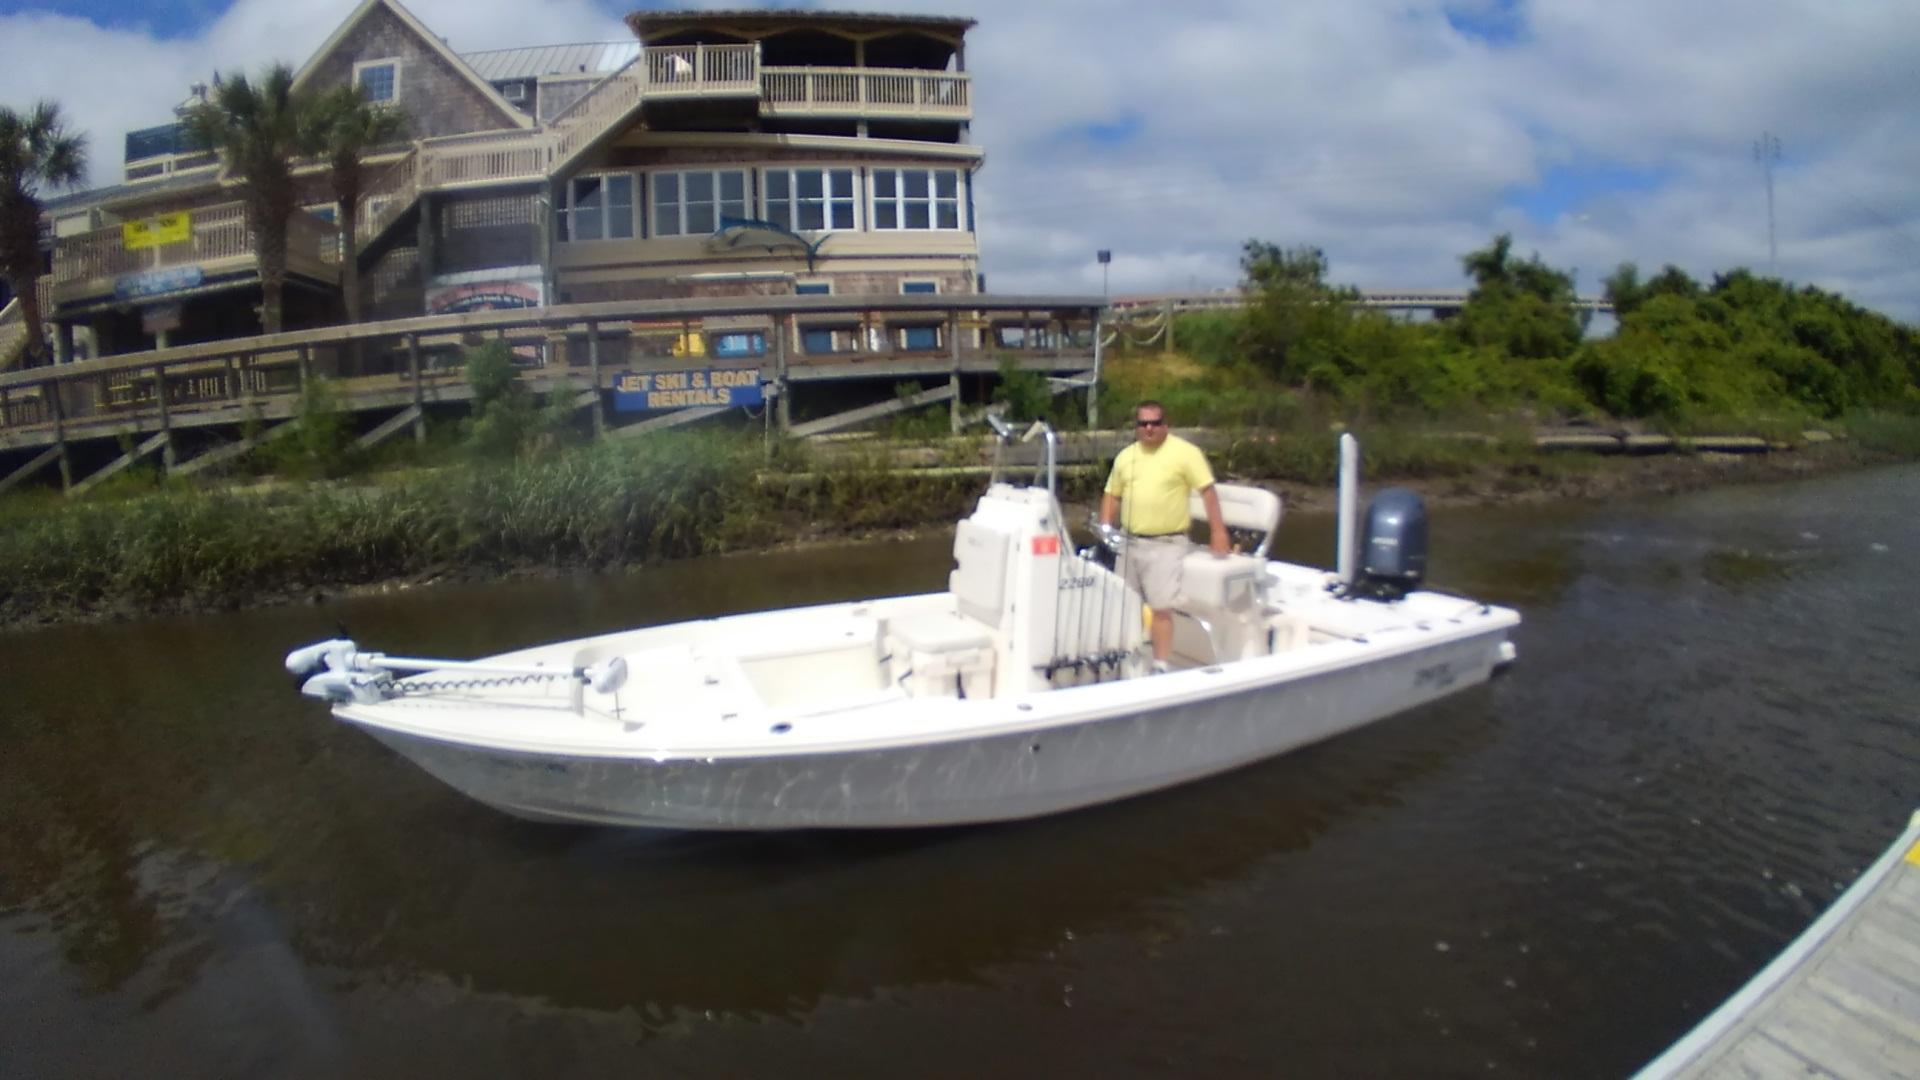 Ocean isle fishing charters ocean isle beach north carolina for Fishing charters carolina beach nc